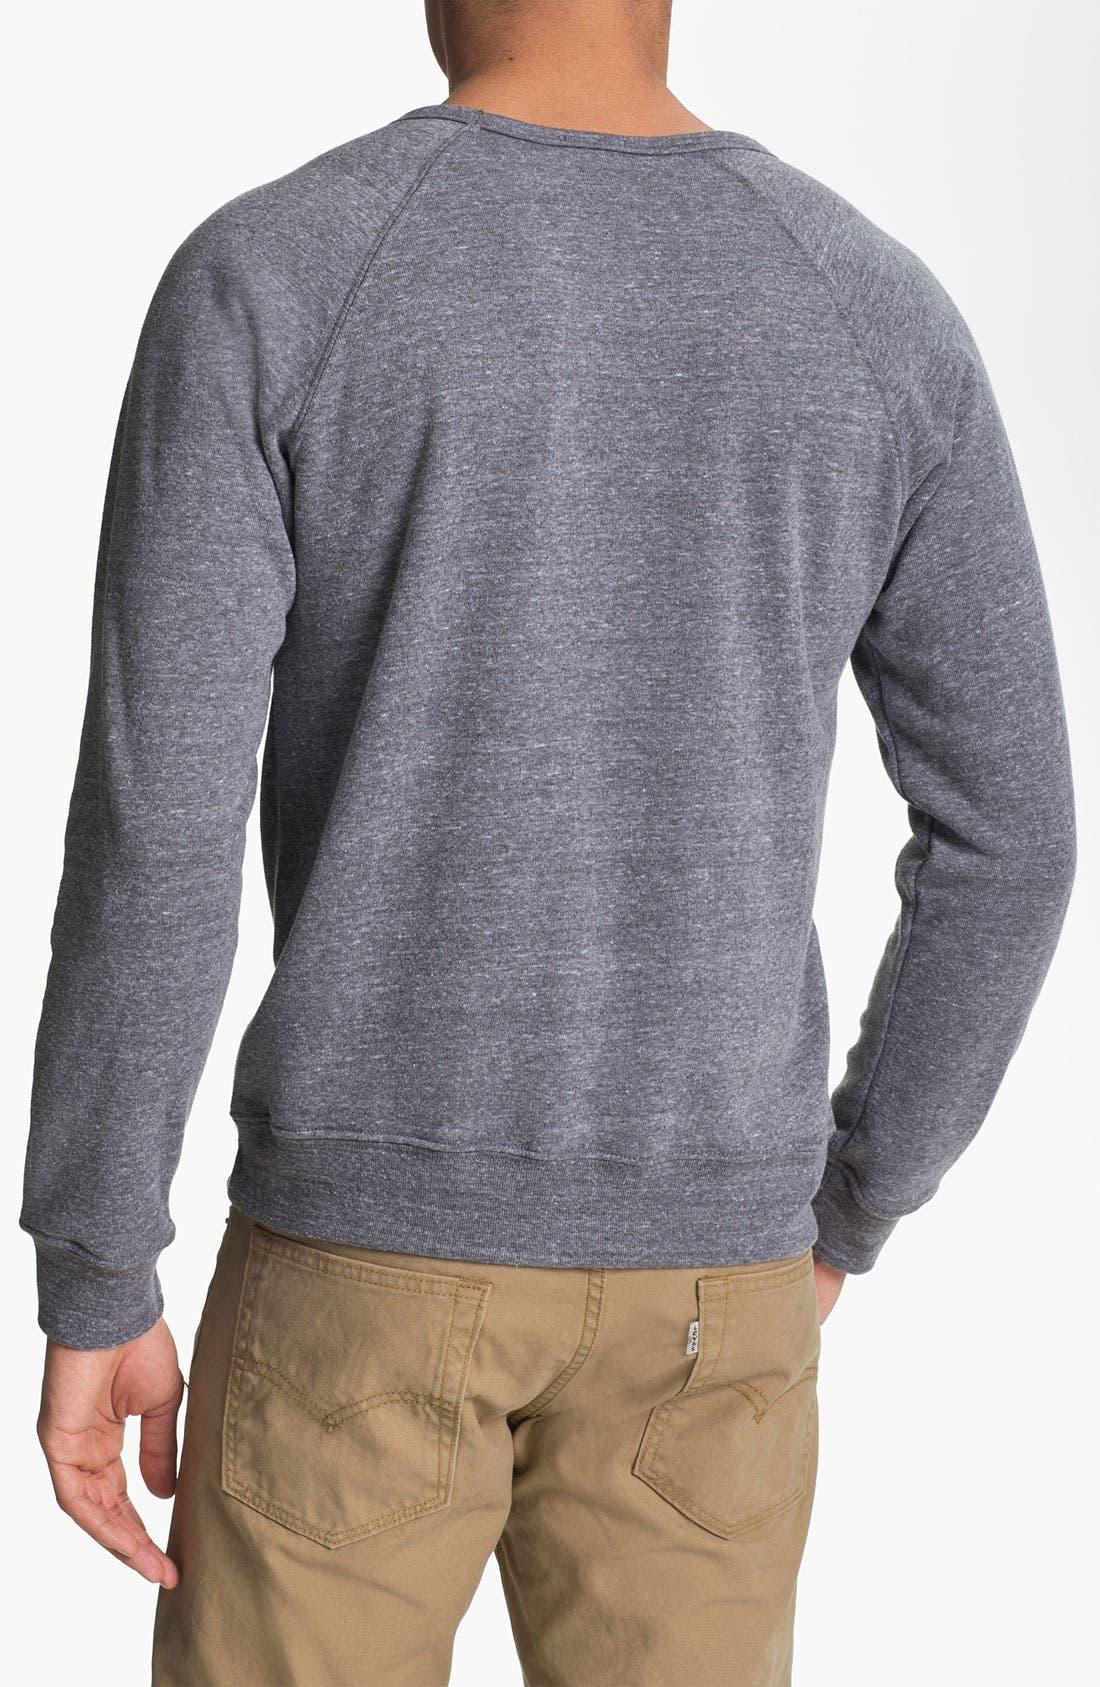 Alternate Image 2  - Obey 'Oh Boy' Graphic Crewneck Sweatshirt